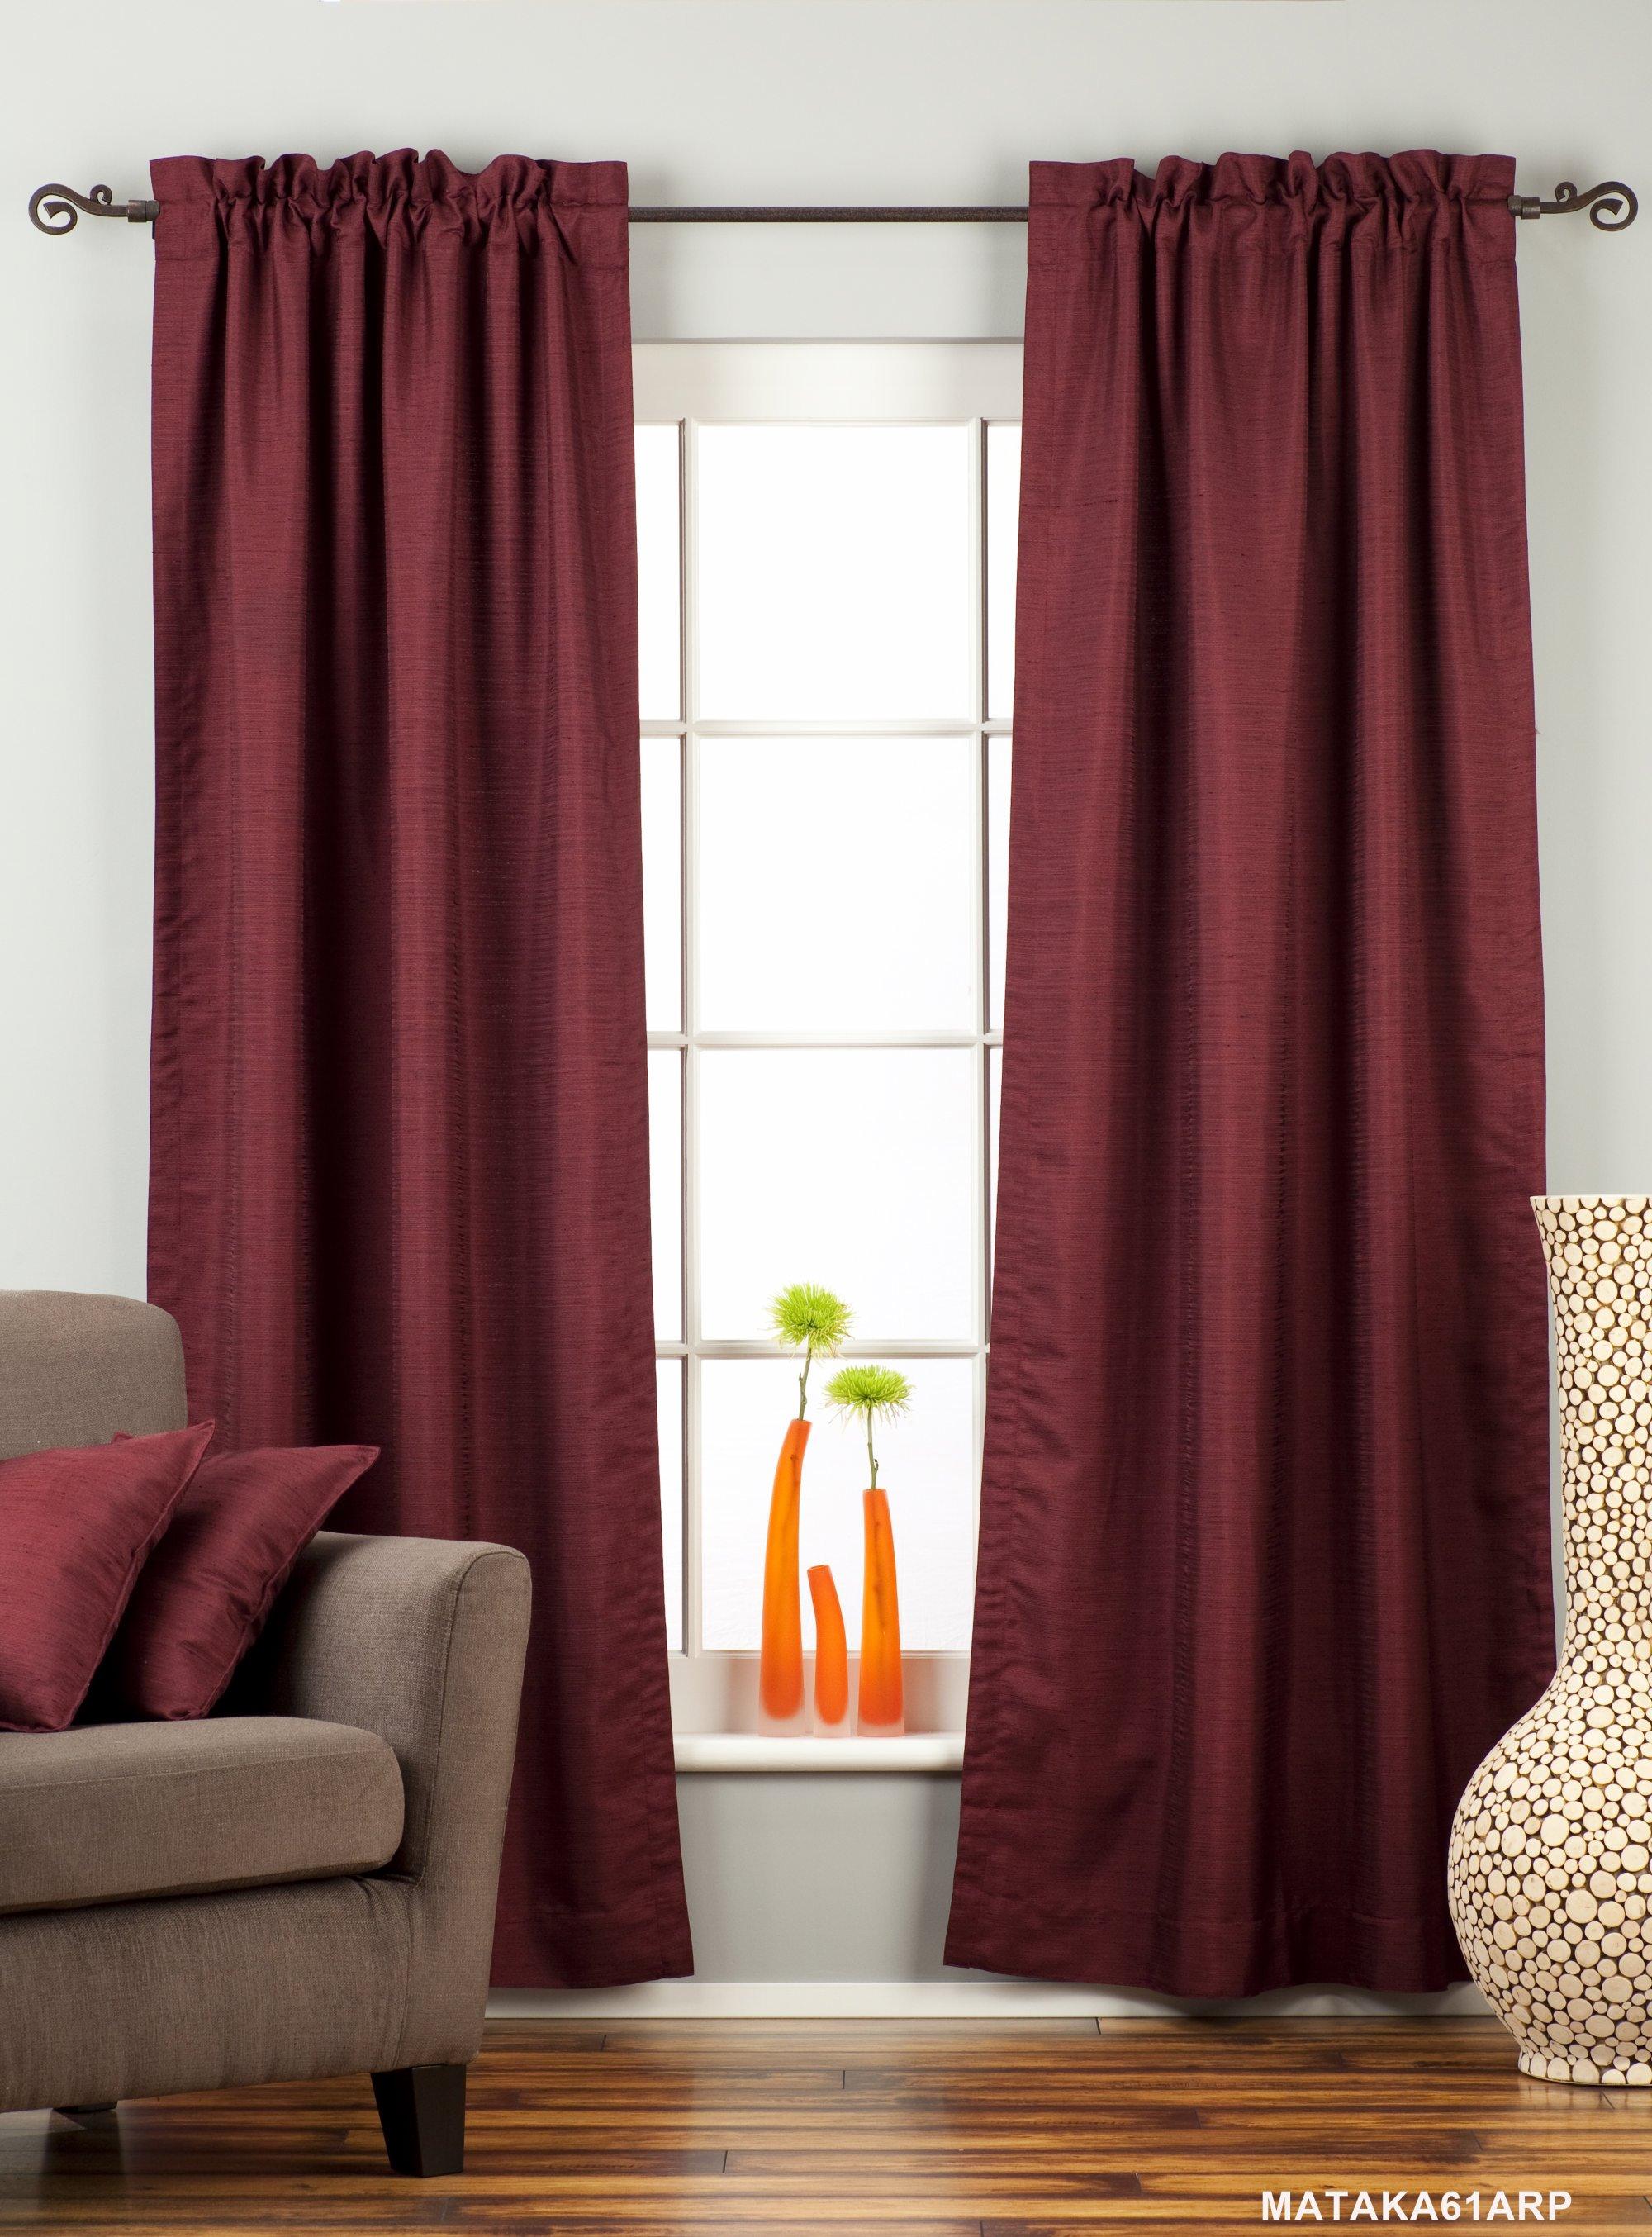 Burgundy Curtains for Living Room | Roy Home Design